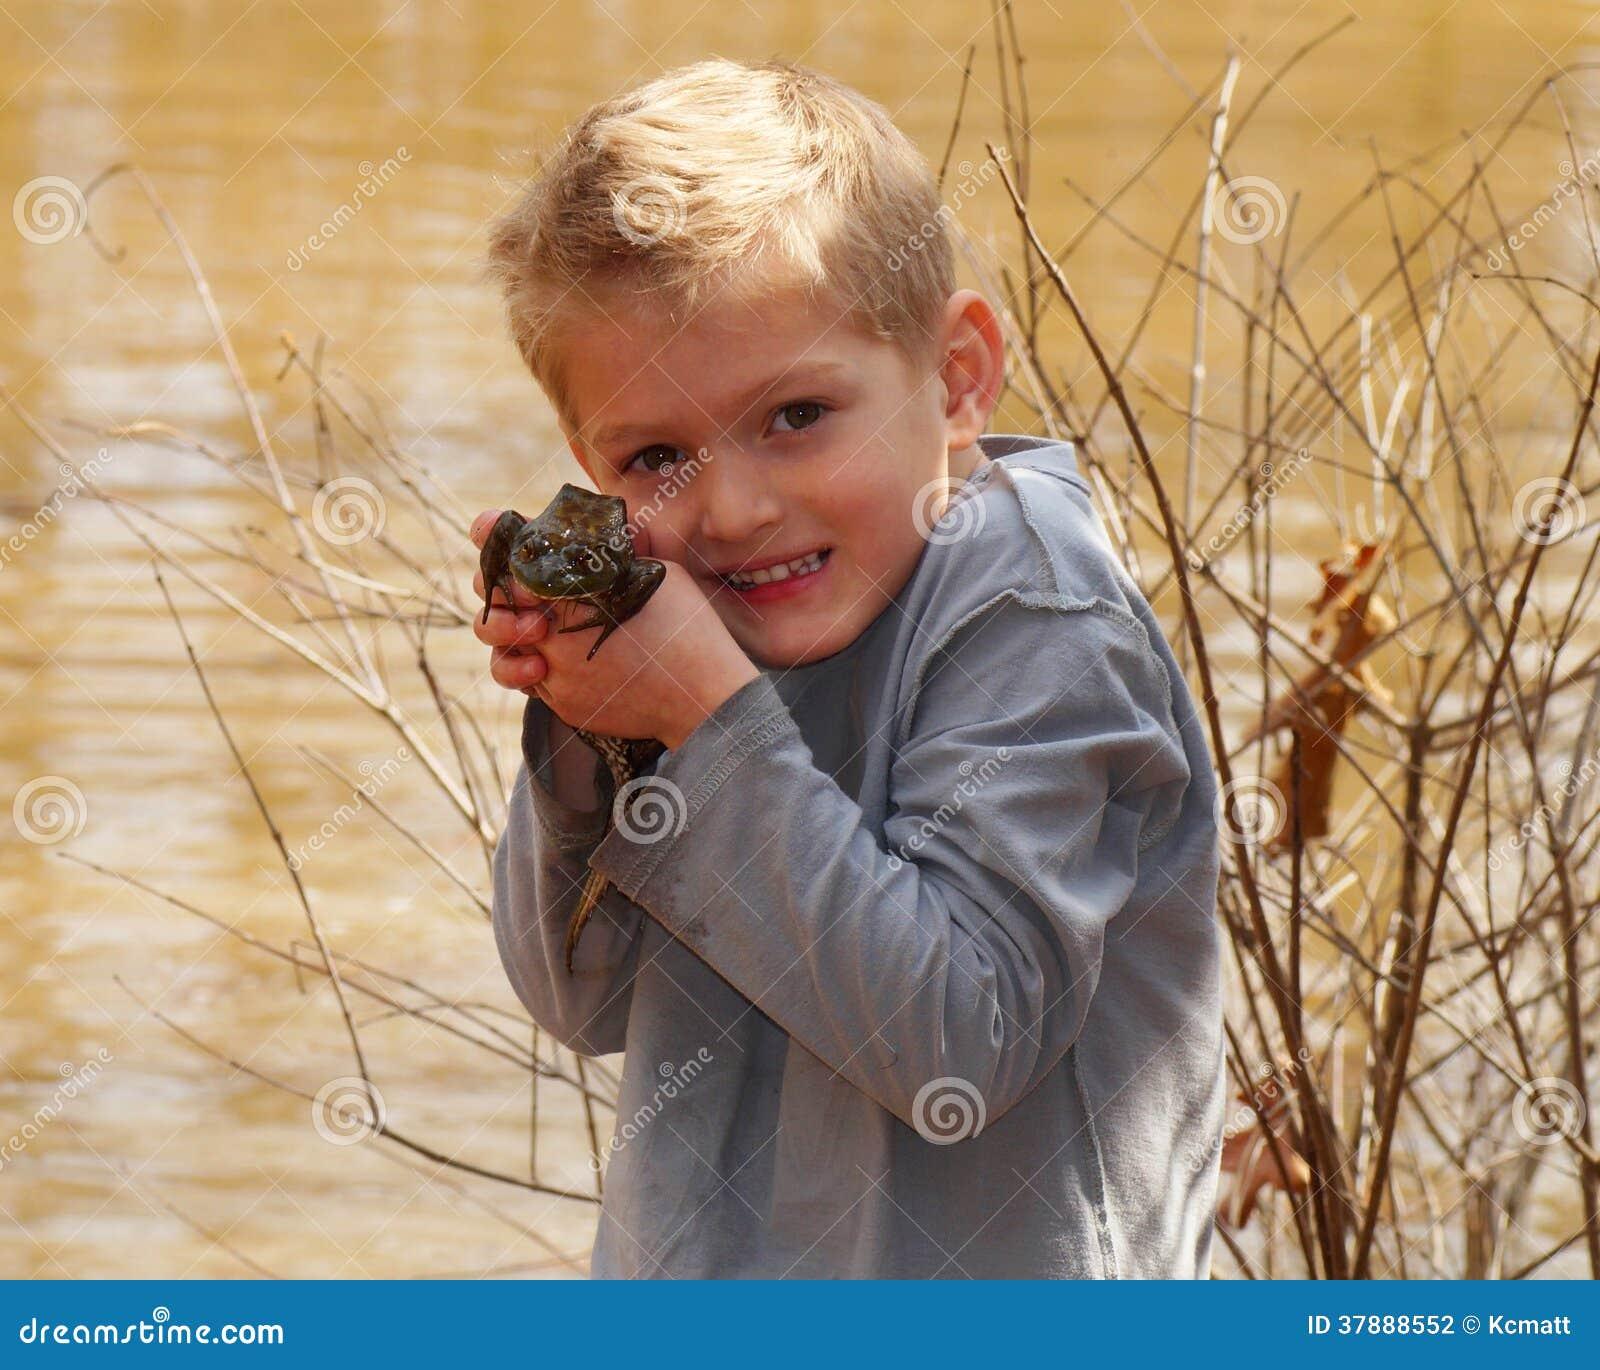 Child holding a large bullfrog